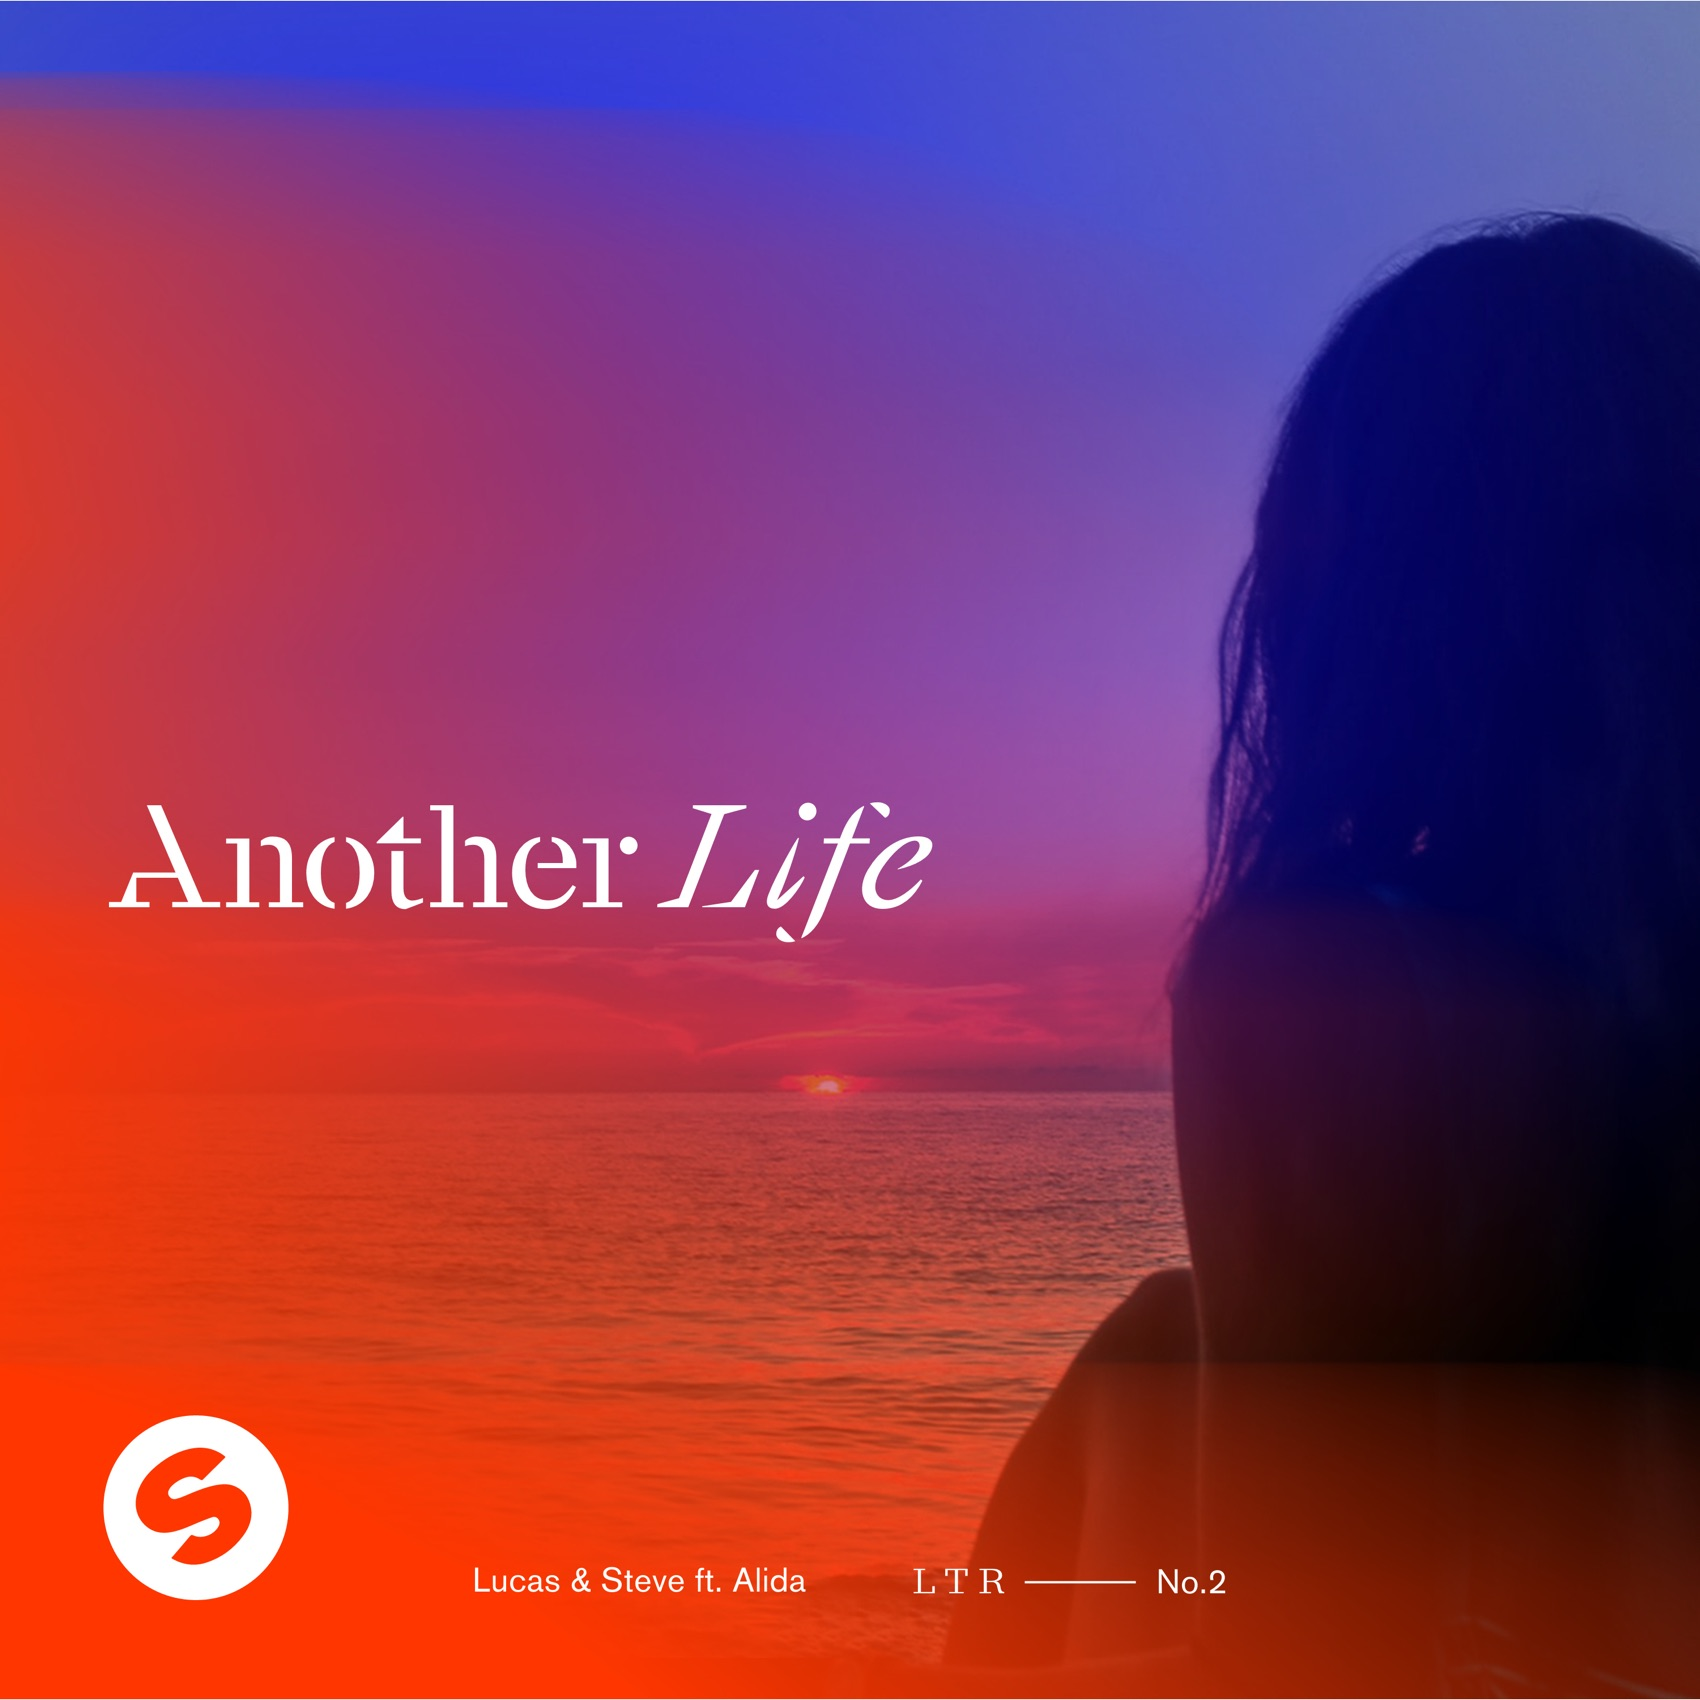 Lucas & Steve, Alida - Another Life (feat. Alida)